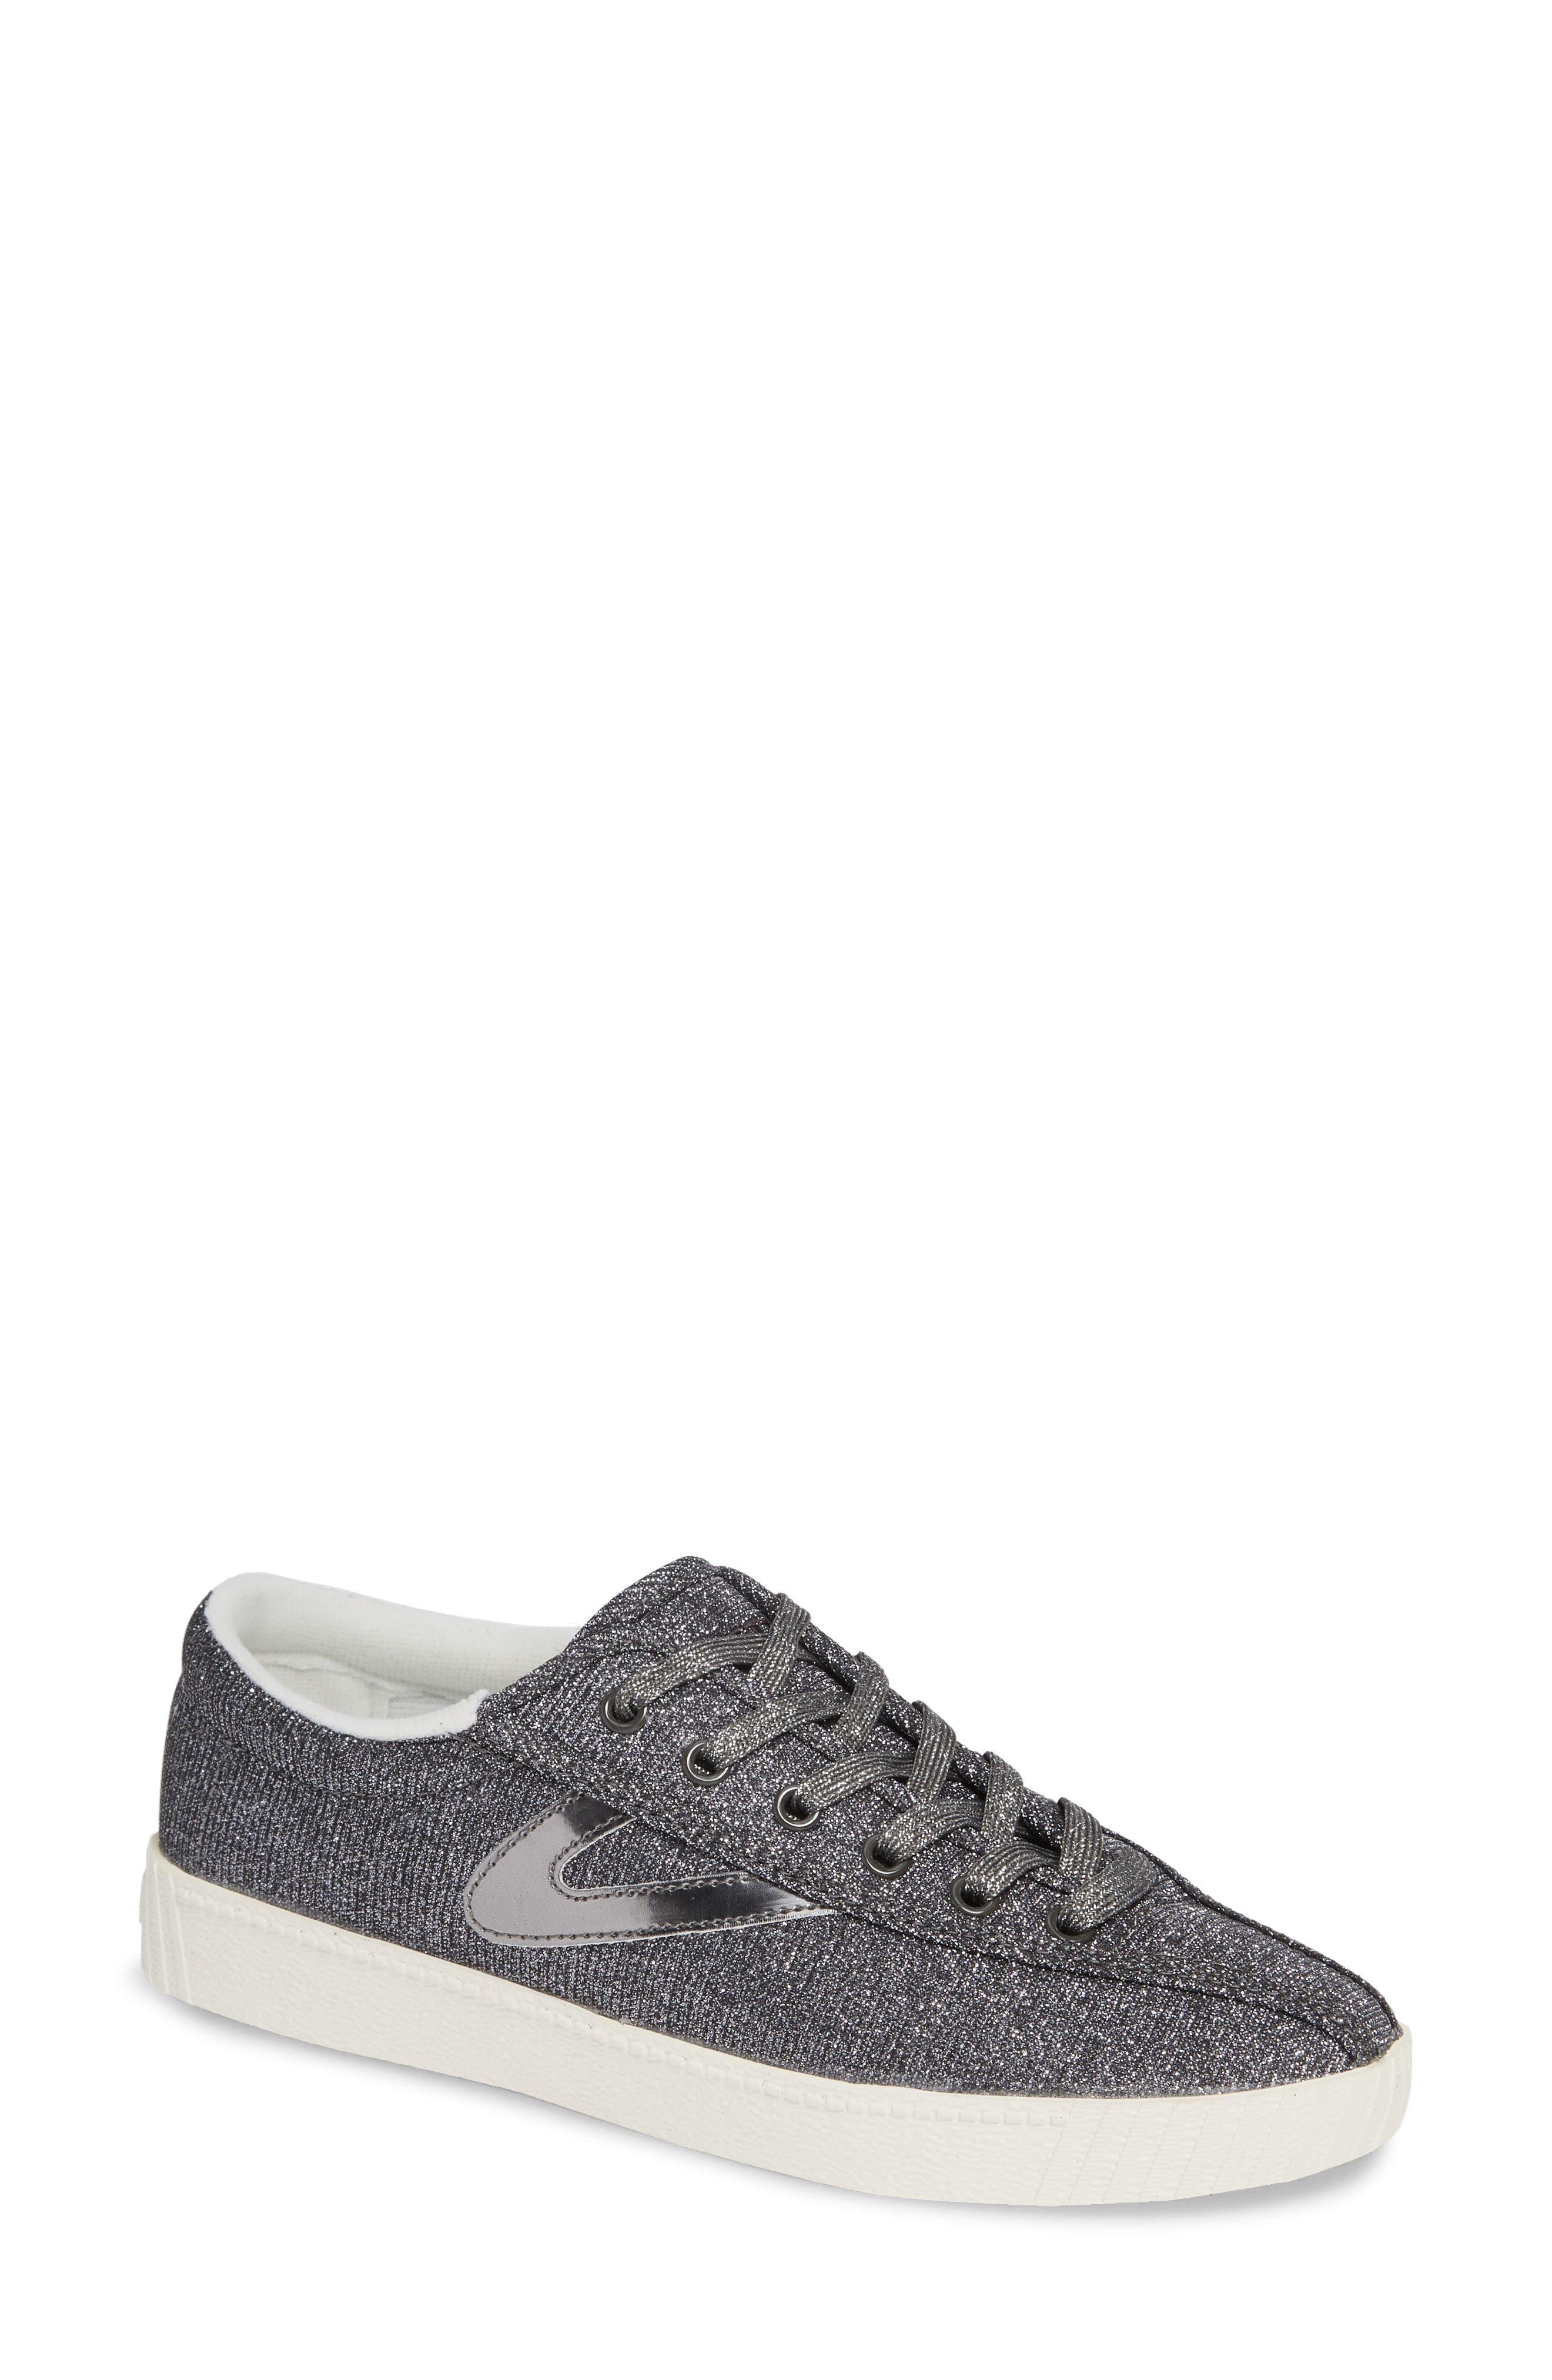 ,                             'Nylite' Sneaker,                             Main thumbnail 1, color,                             022